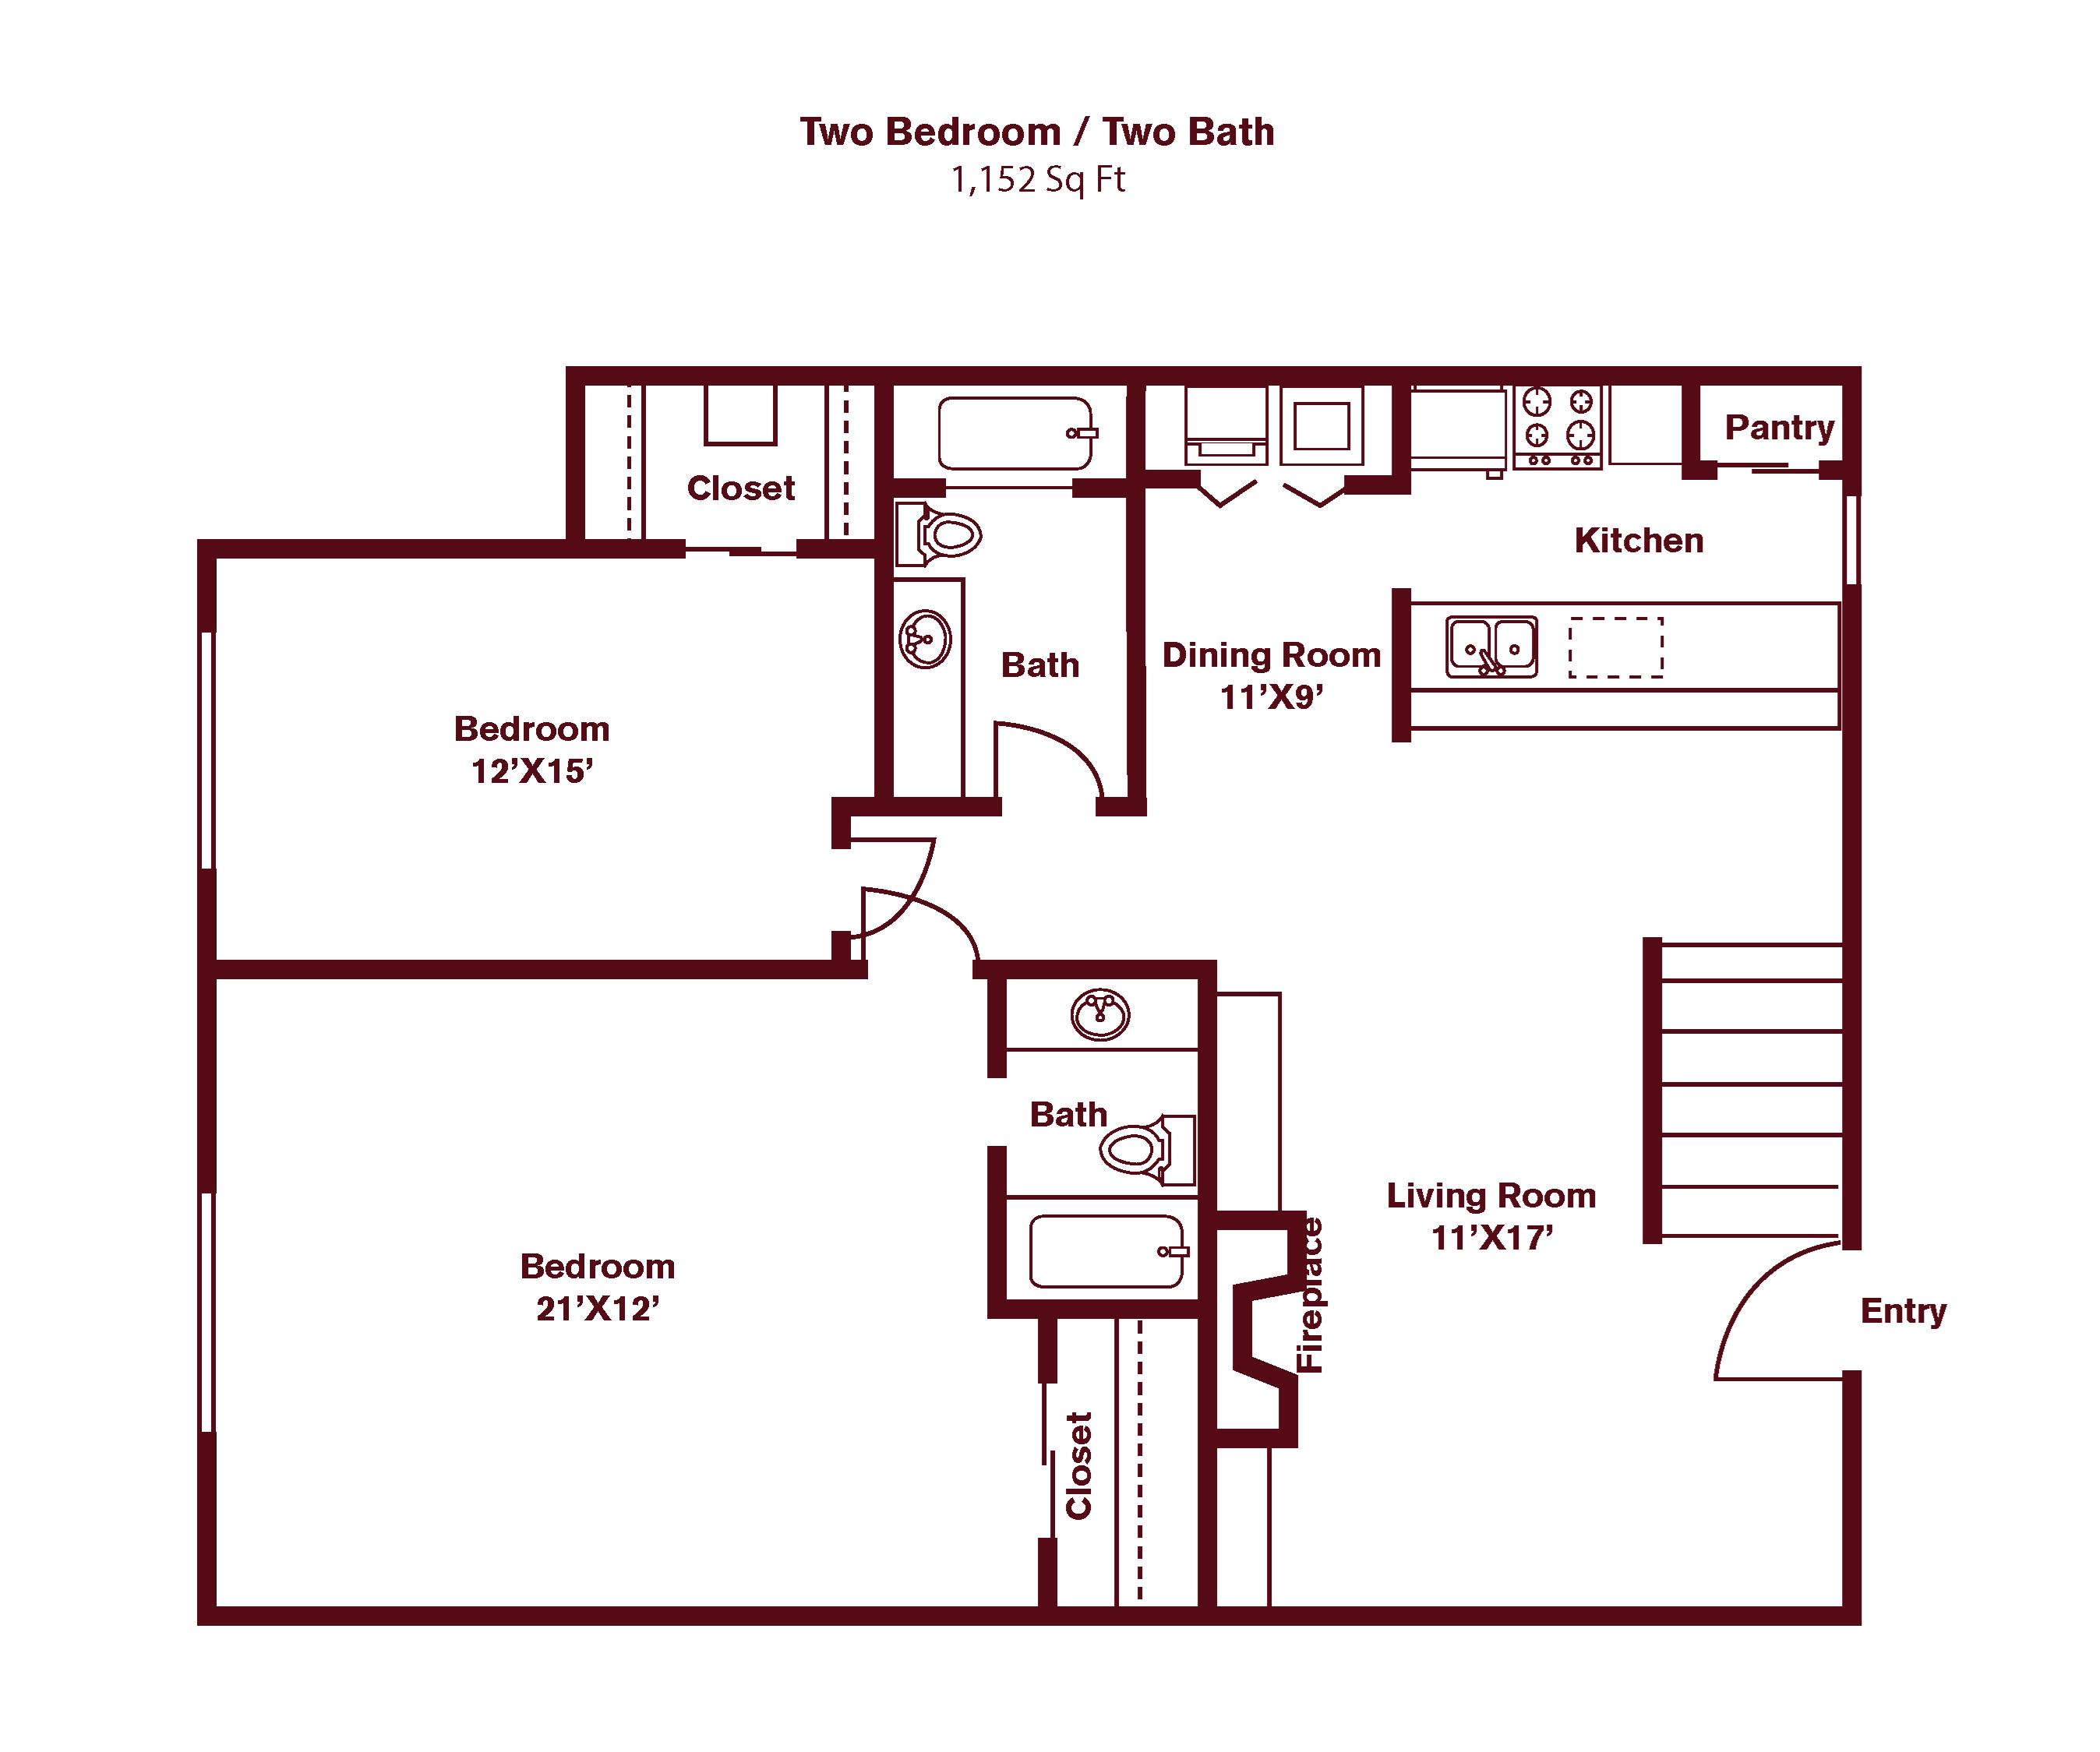 2 Bed/ 2 Bath B7 Floor Plan 18